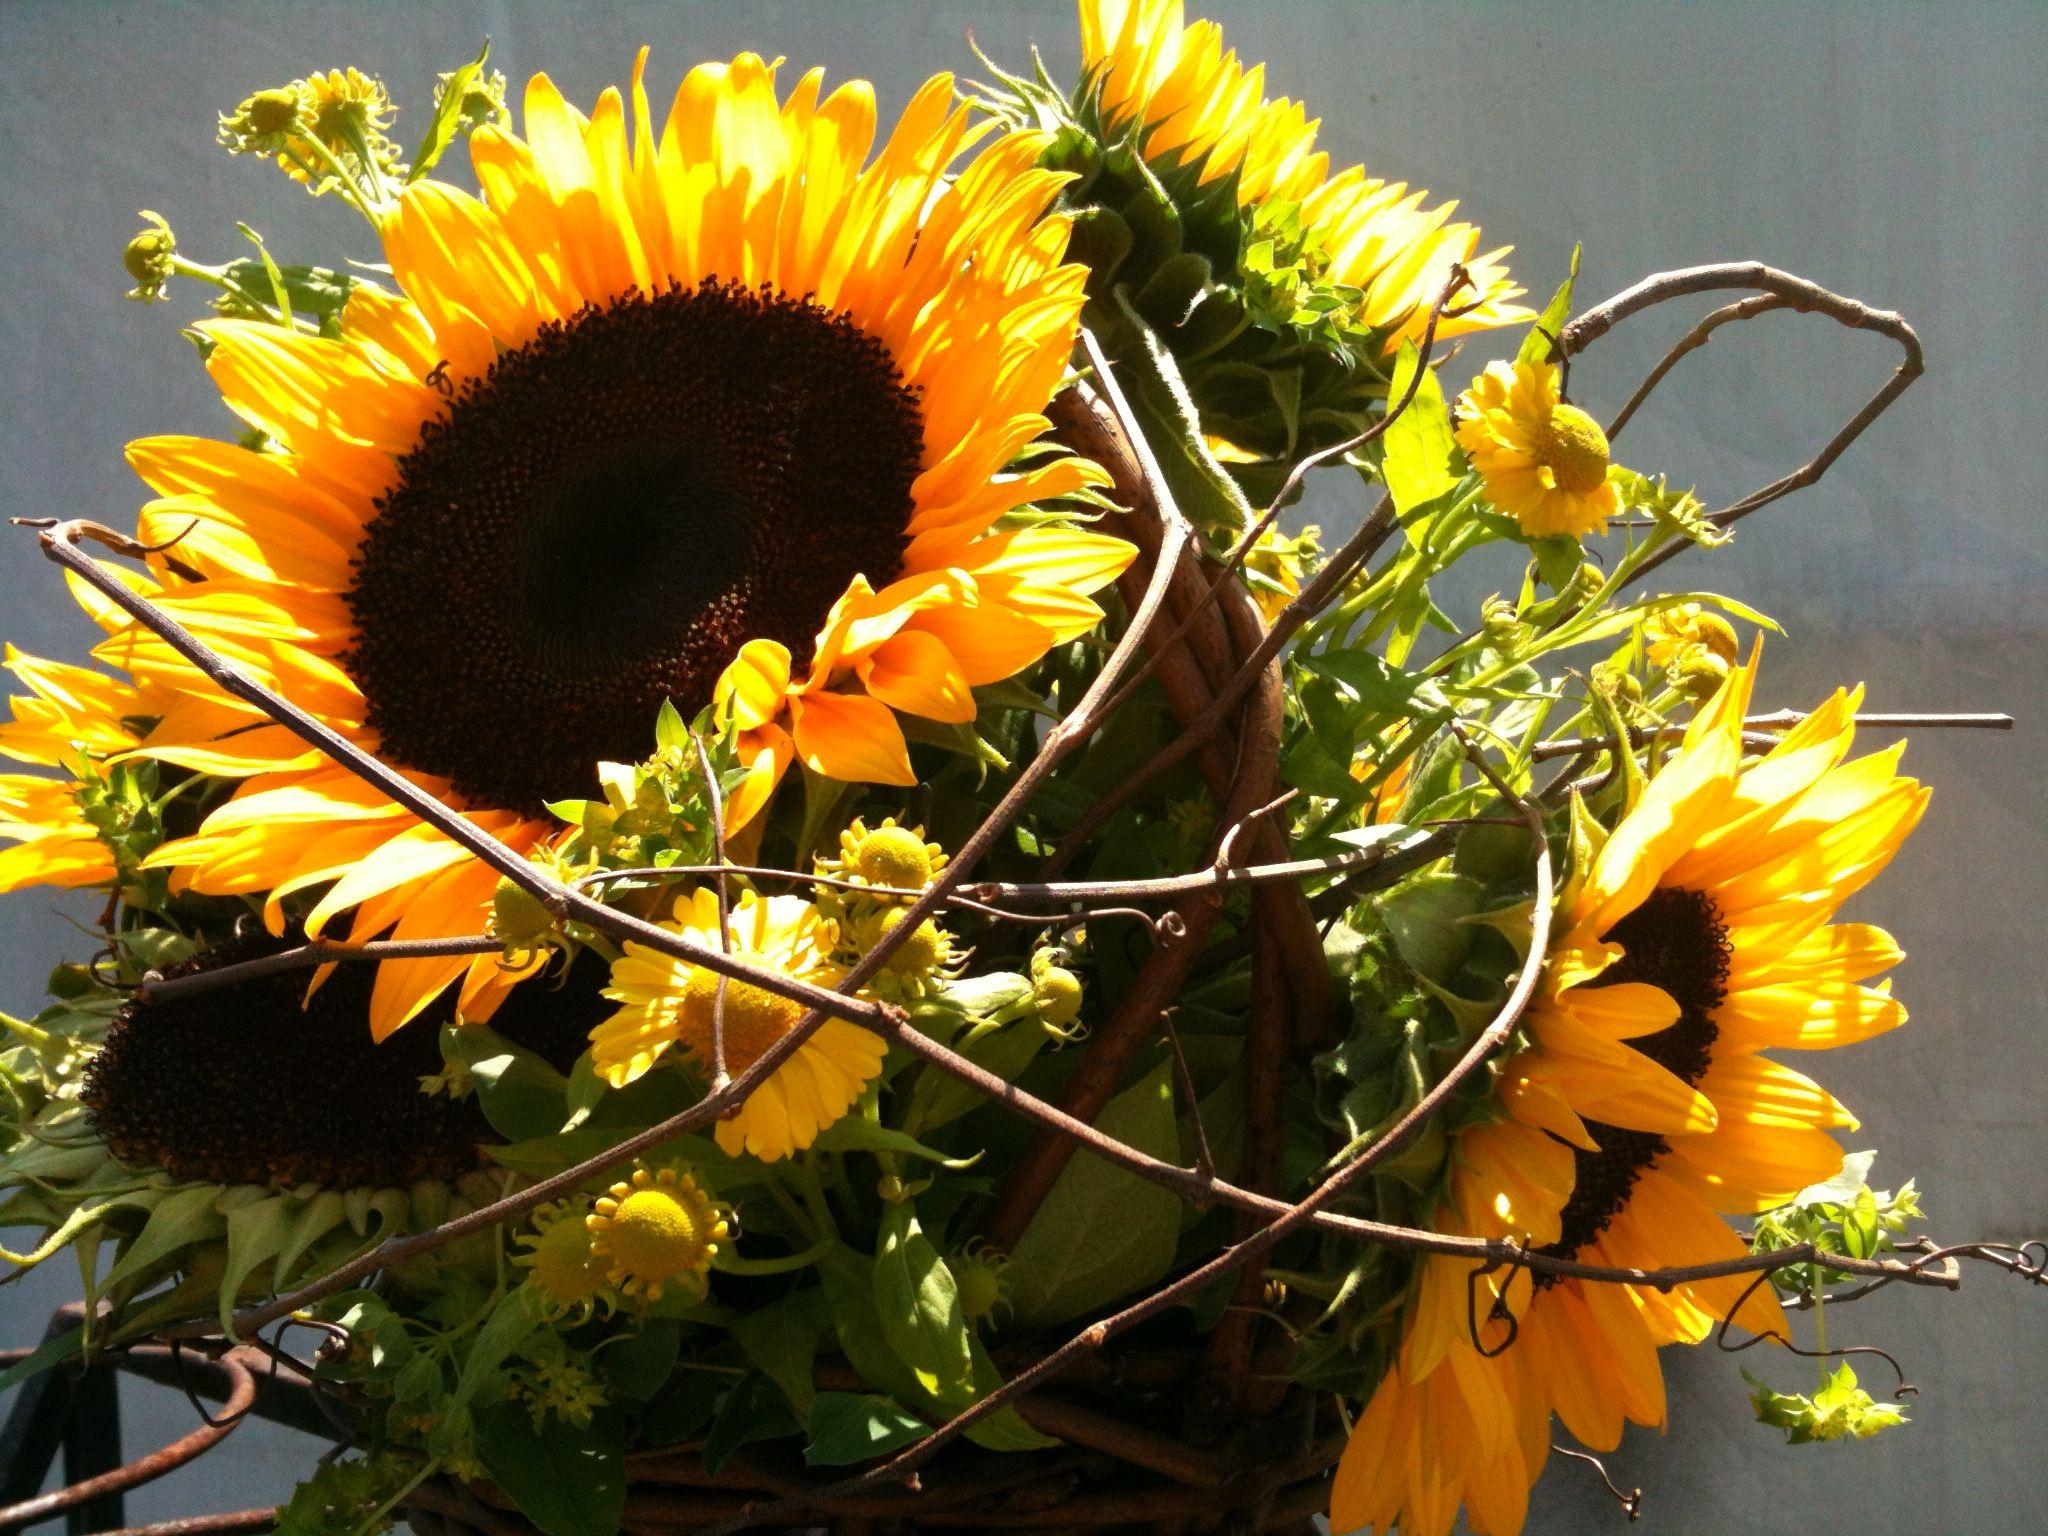 The Sunflower Is The State Flower Of Kansas And The National Flower Of Ukraine Flowers Sunflower Flower Arrangements